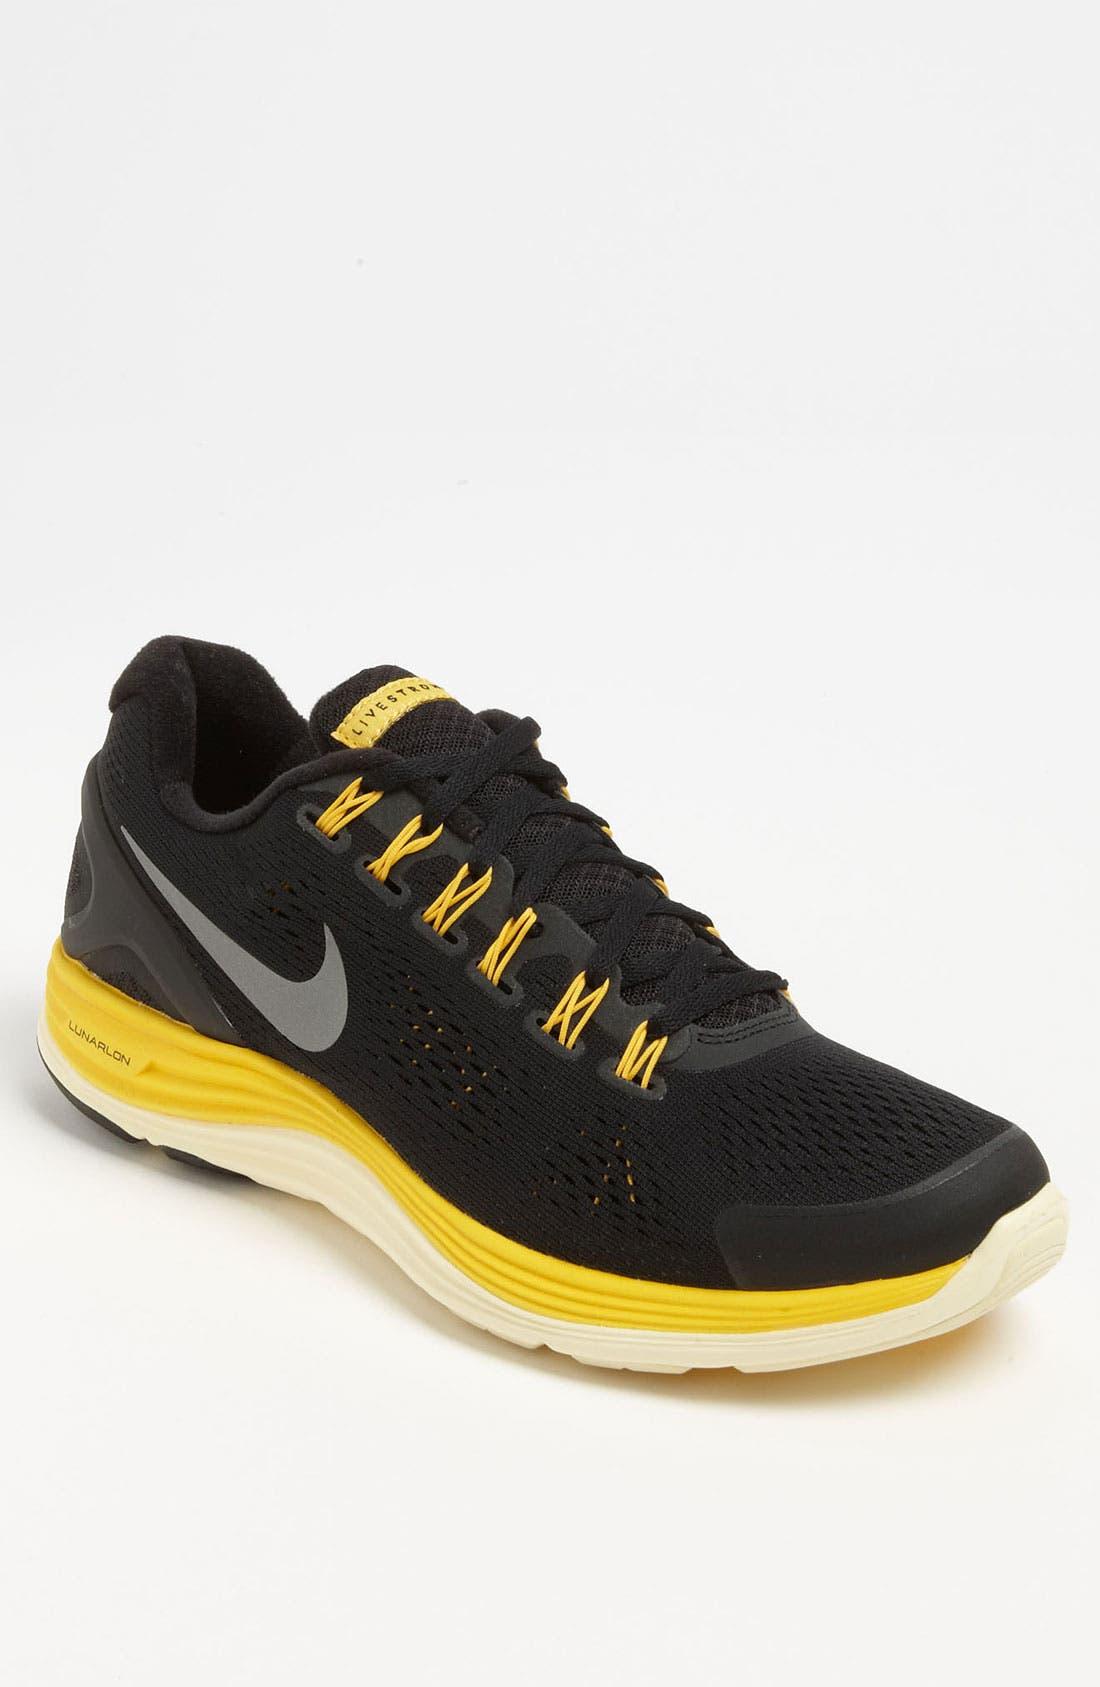 Alternate Image 1 Selected - Nike 'LIVESTRONG LunarGlide+ 4' Running Shoe (Men)